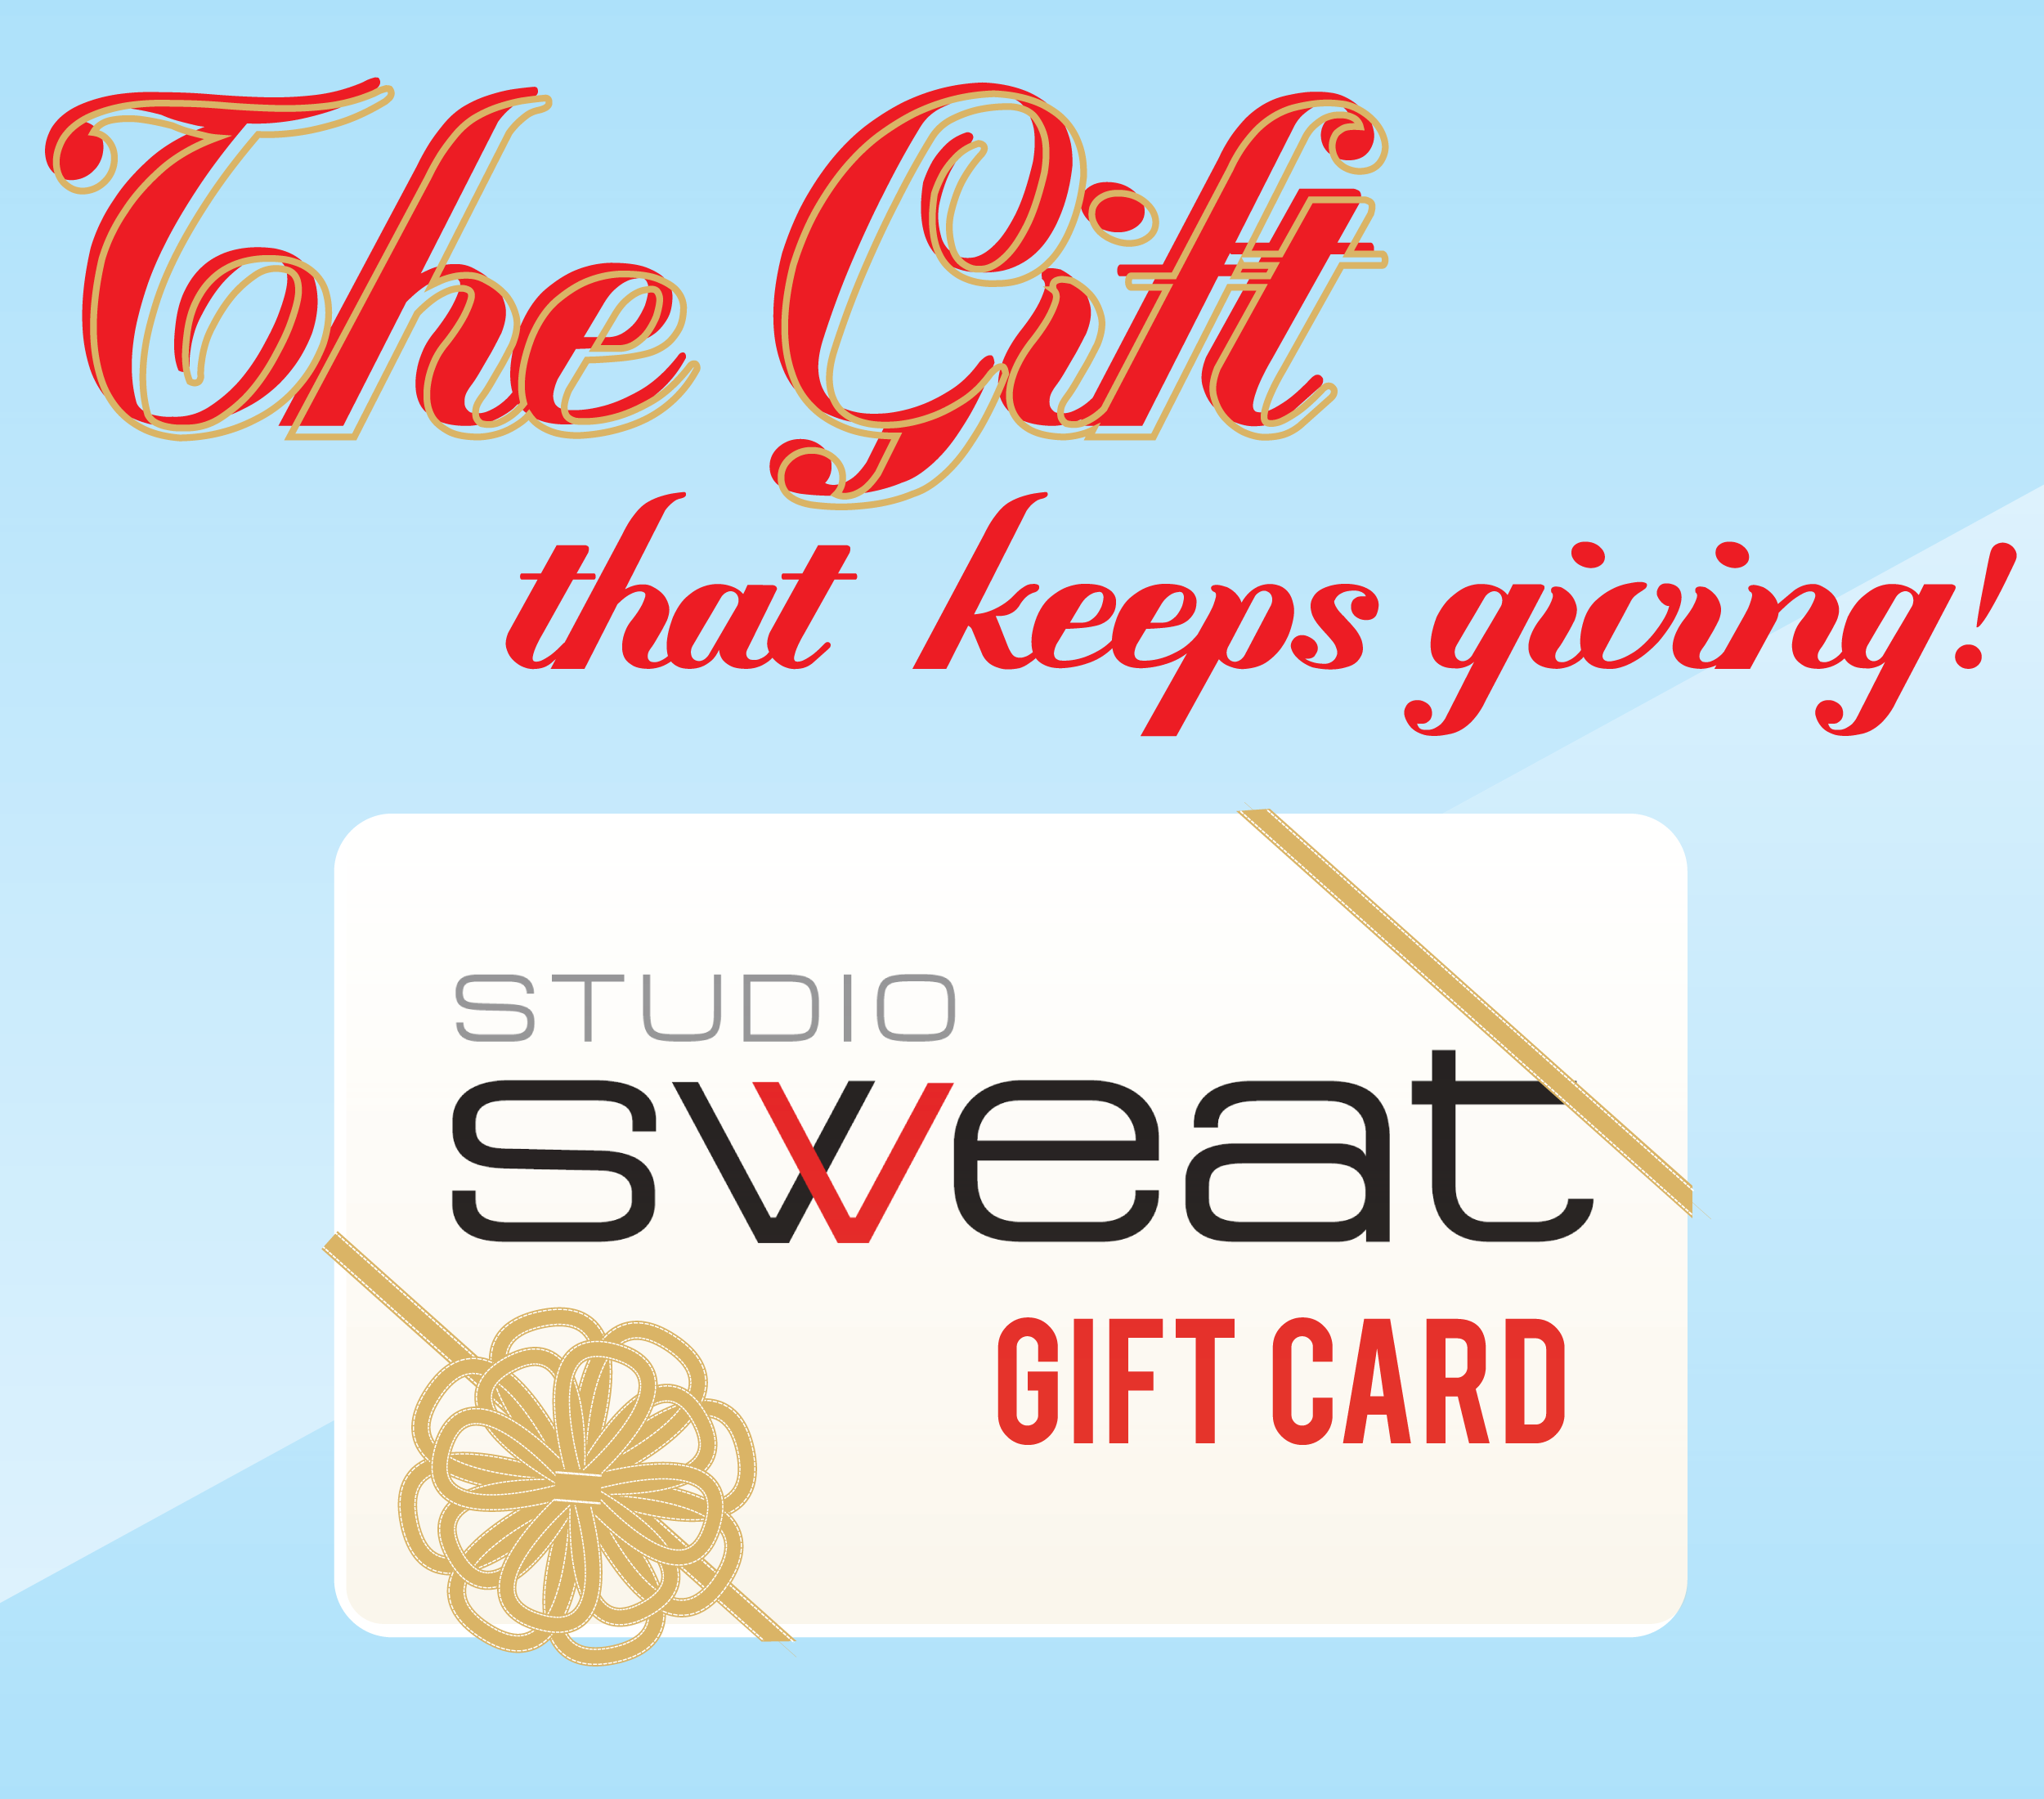 Studio Sweat Gift Card-01